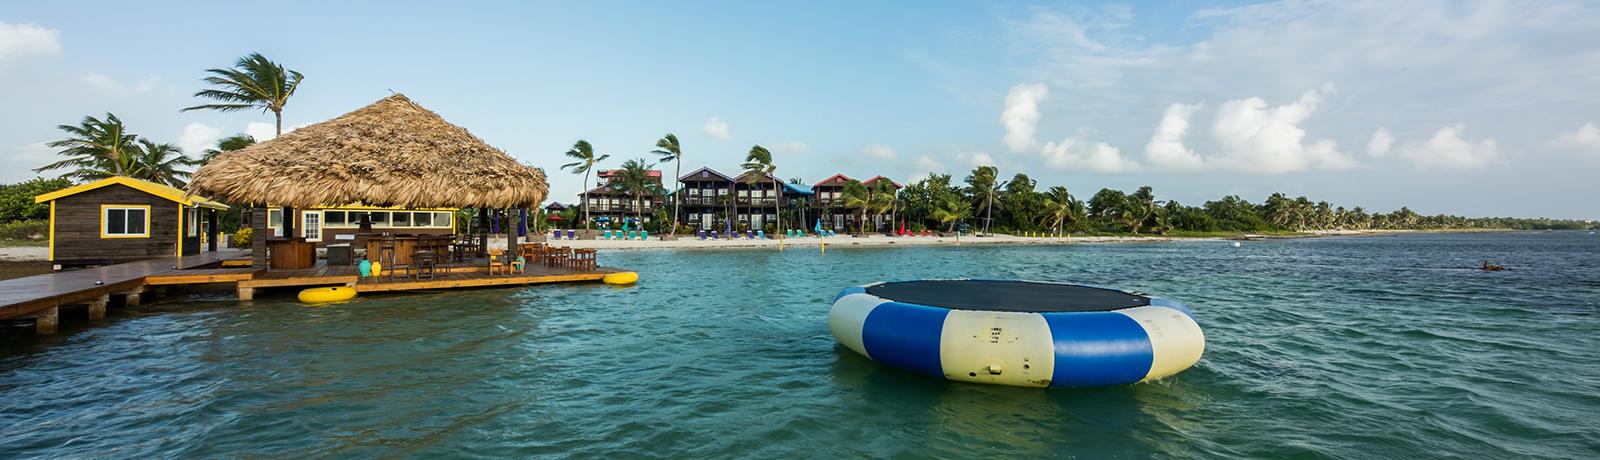 Xtan-Ha-waterfront-beach-front-in-San-Pedro